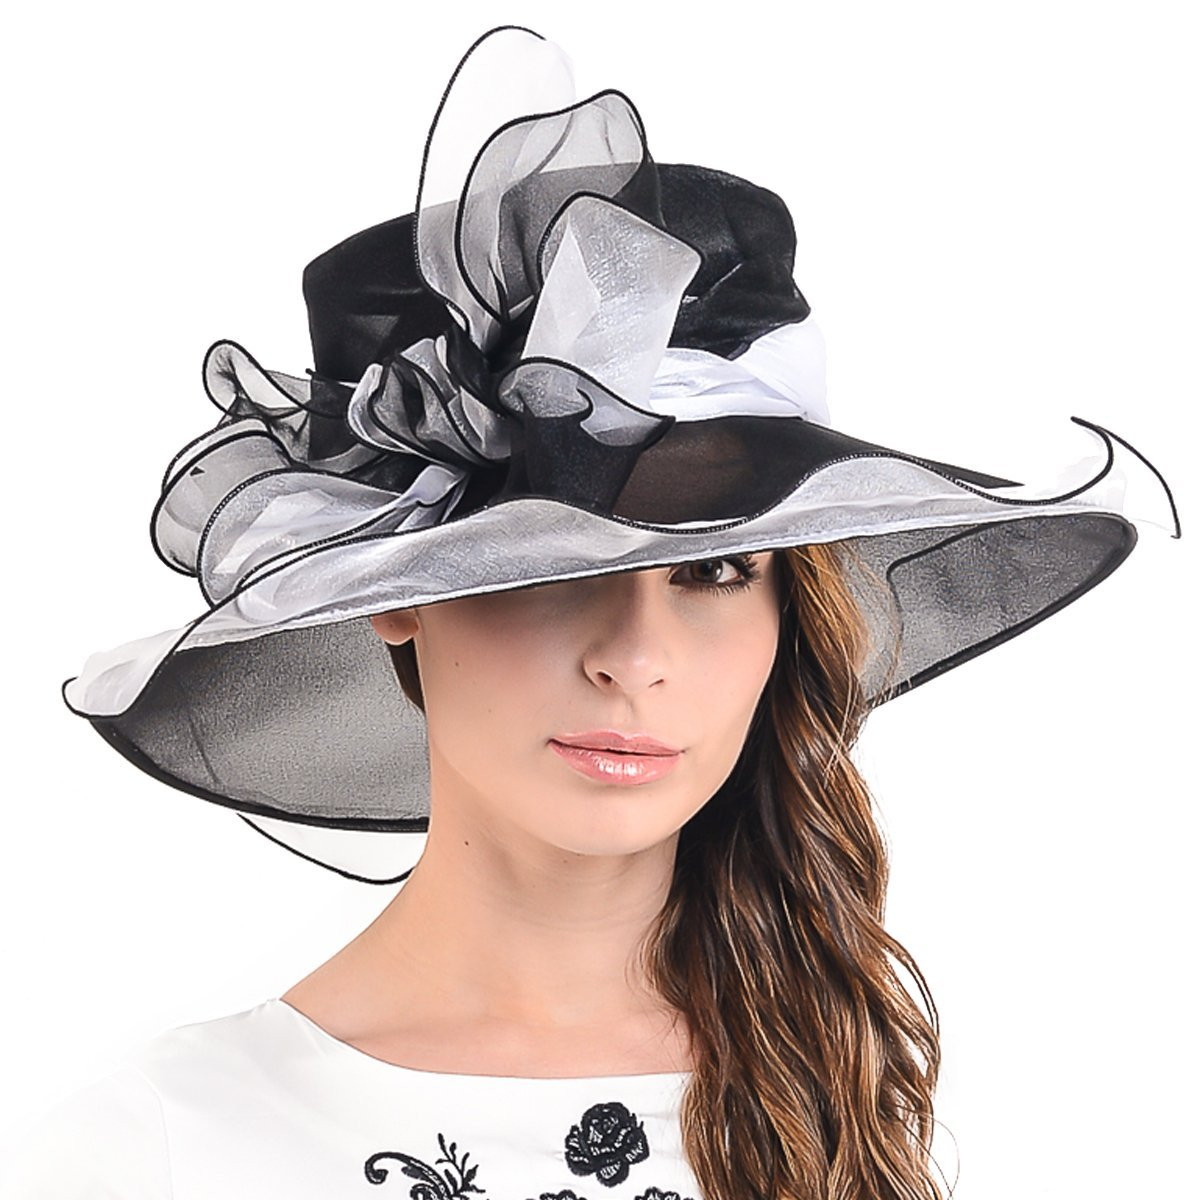 Womens Church Dress Derby Wedding Floral Tea Party Hat Ss-035 (Bow-Black White)